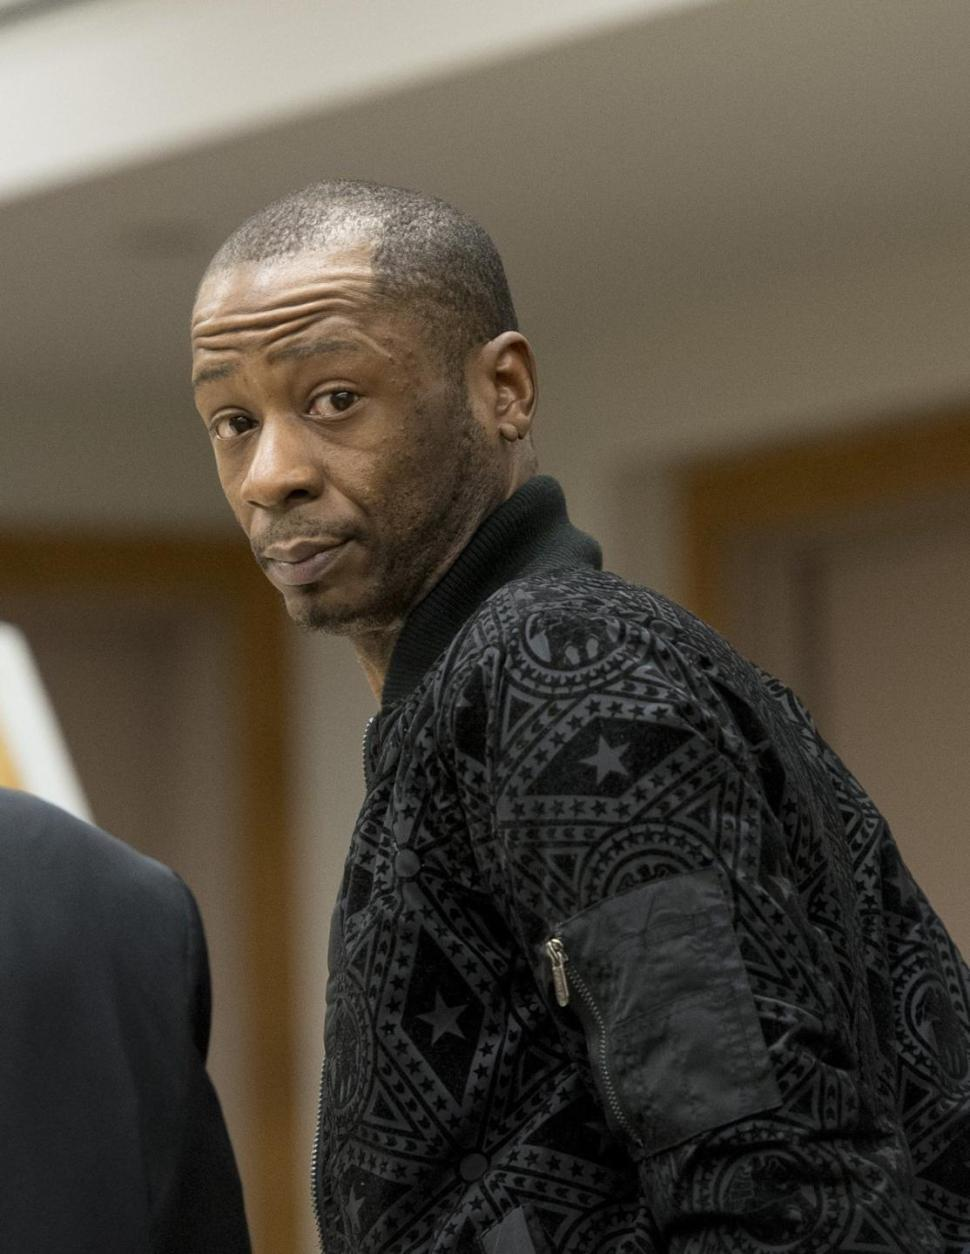 Maurice Hines sex trafficking